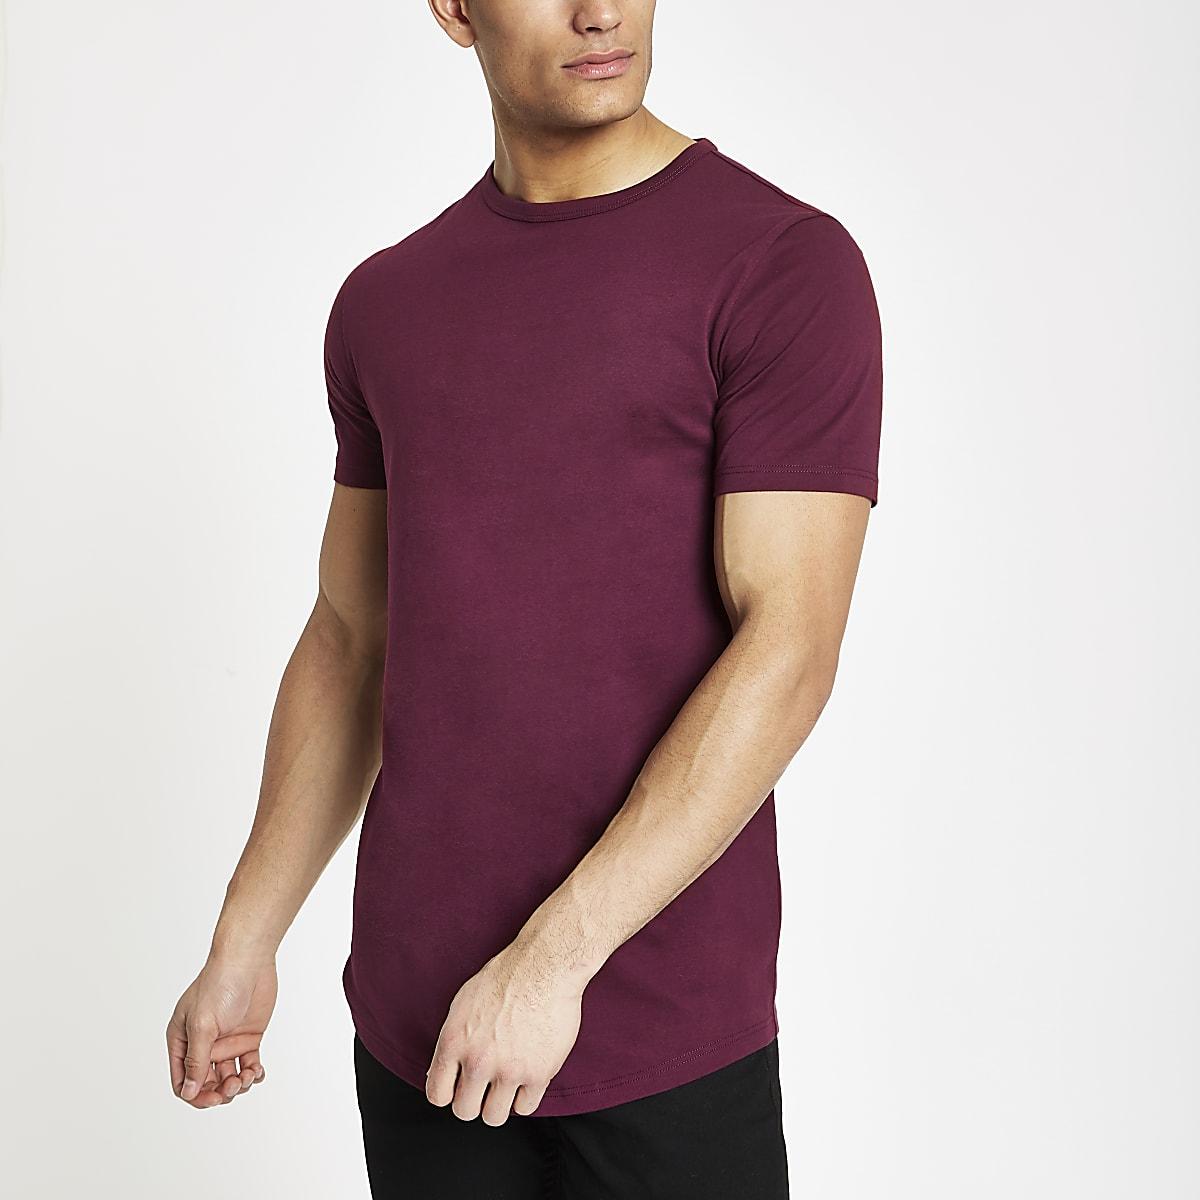 Rood lang T-shirt met ronde zoom